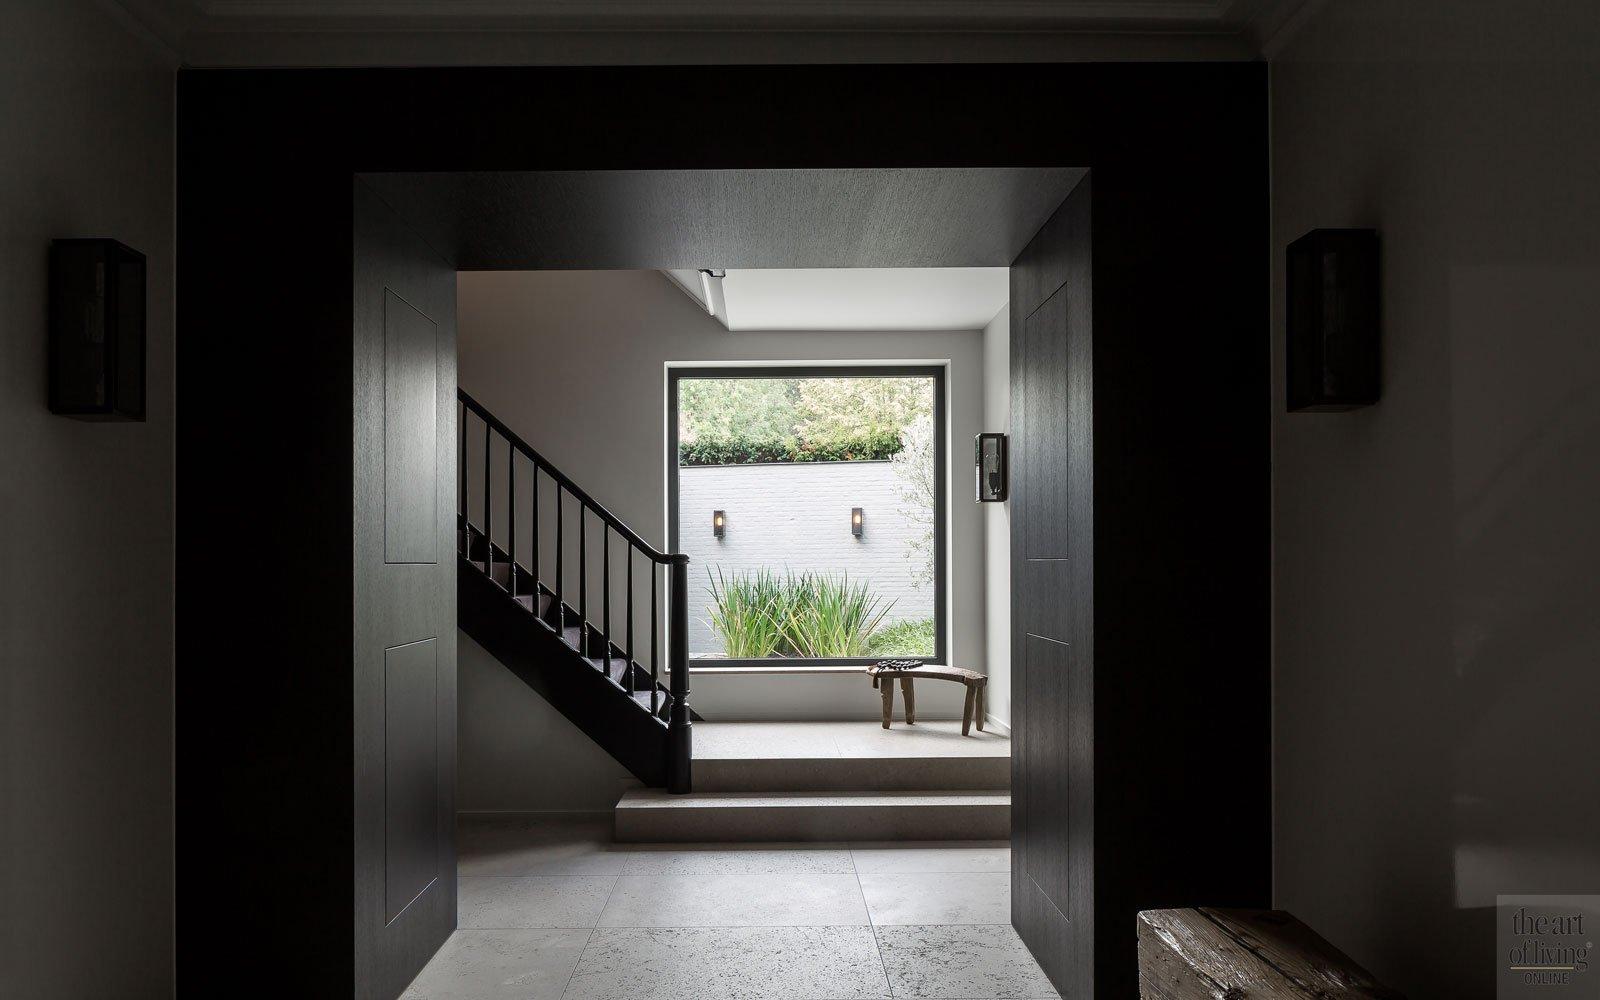 Inkom, entree, hal, trap, groot raam, patio, zwemvijver, tuin, Cools tuinaanleg, herenhuis, renovatie, JUMA Architects